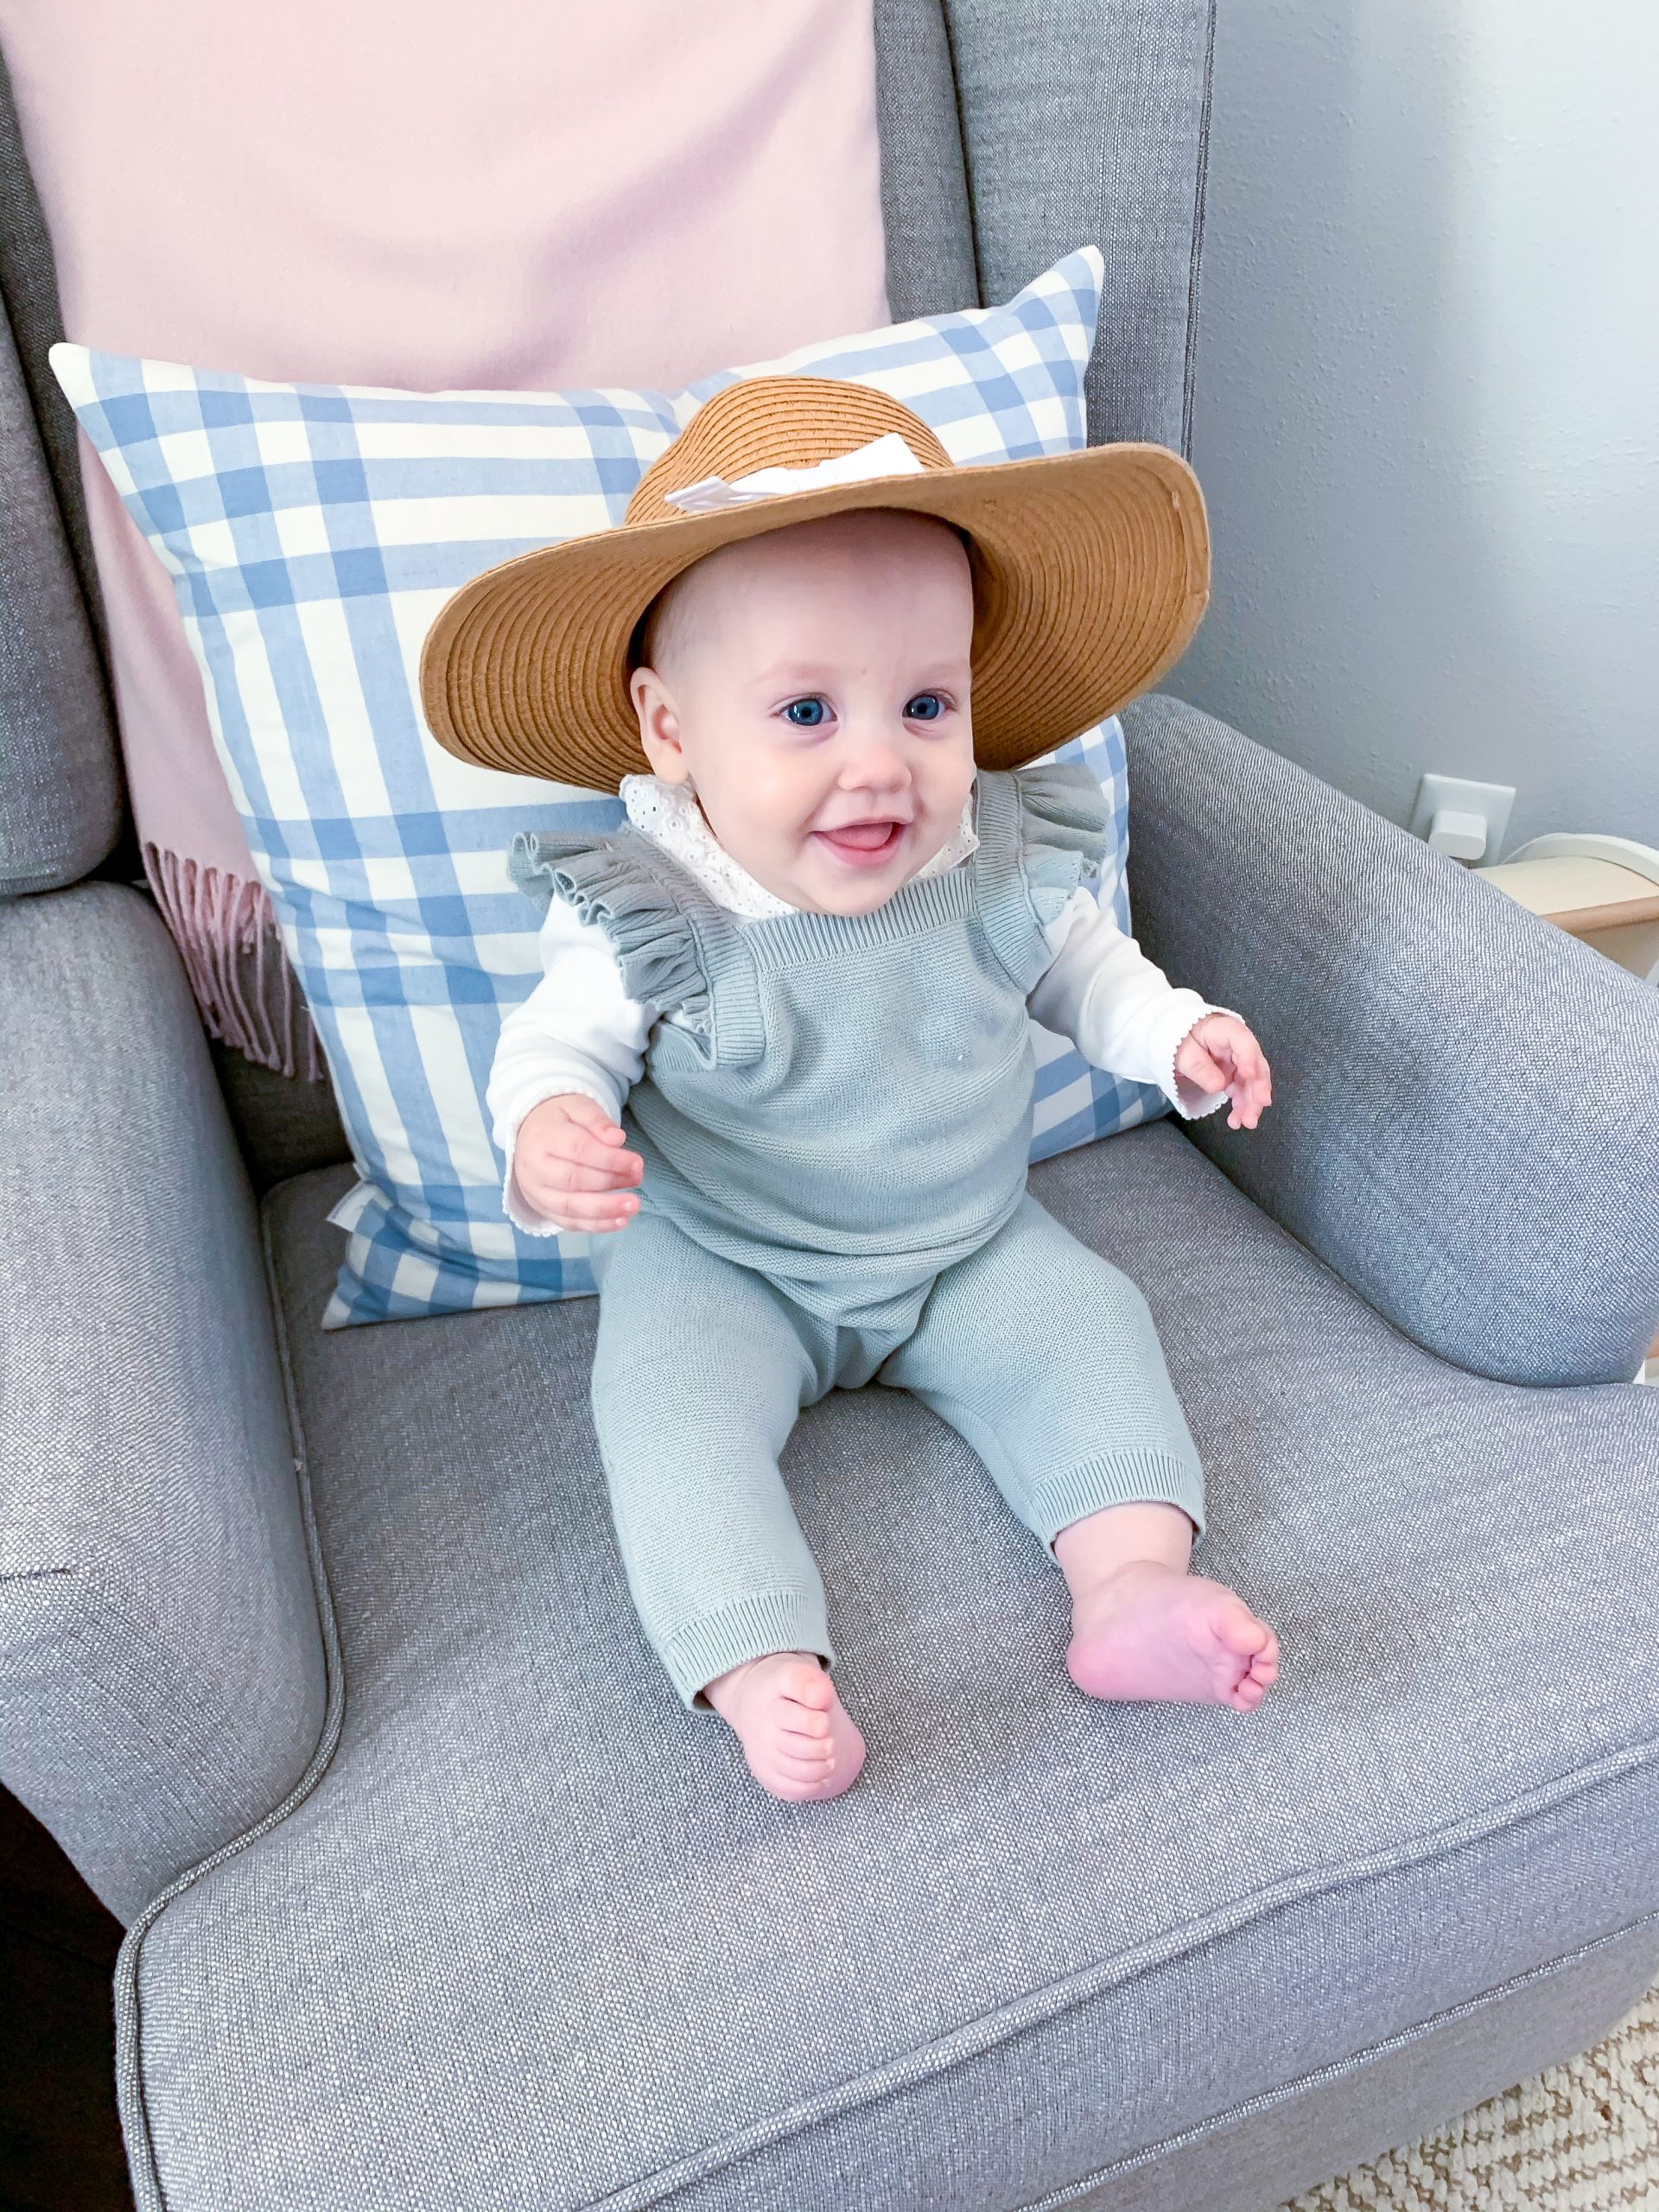 Southern baby style, Southern style blogger, Southern motherhood, Southern Living style